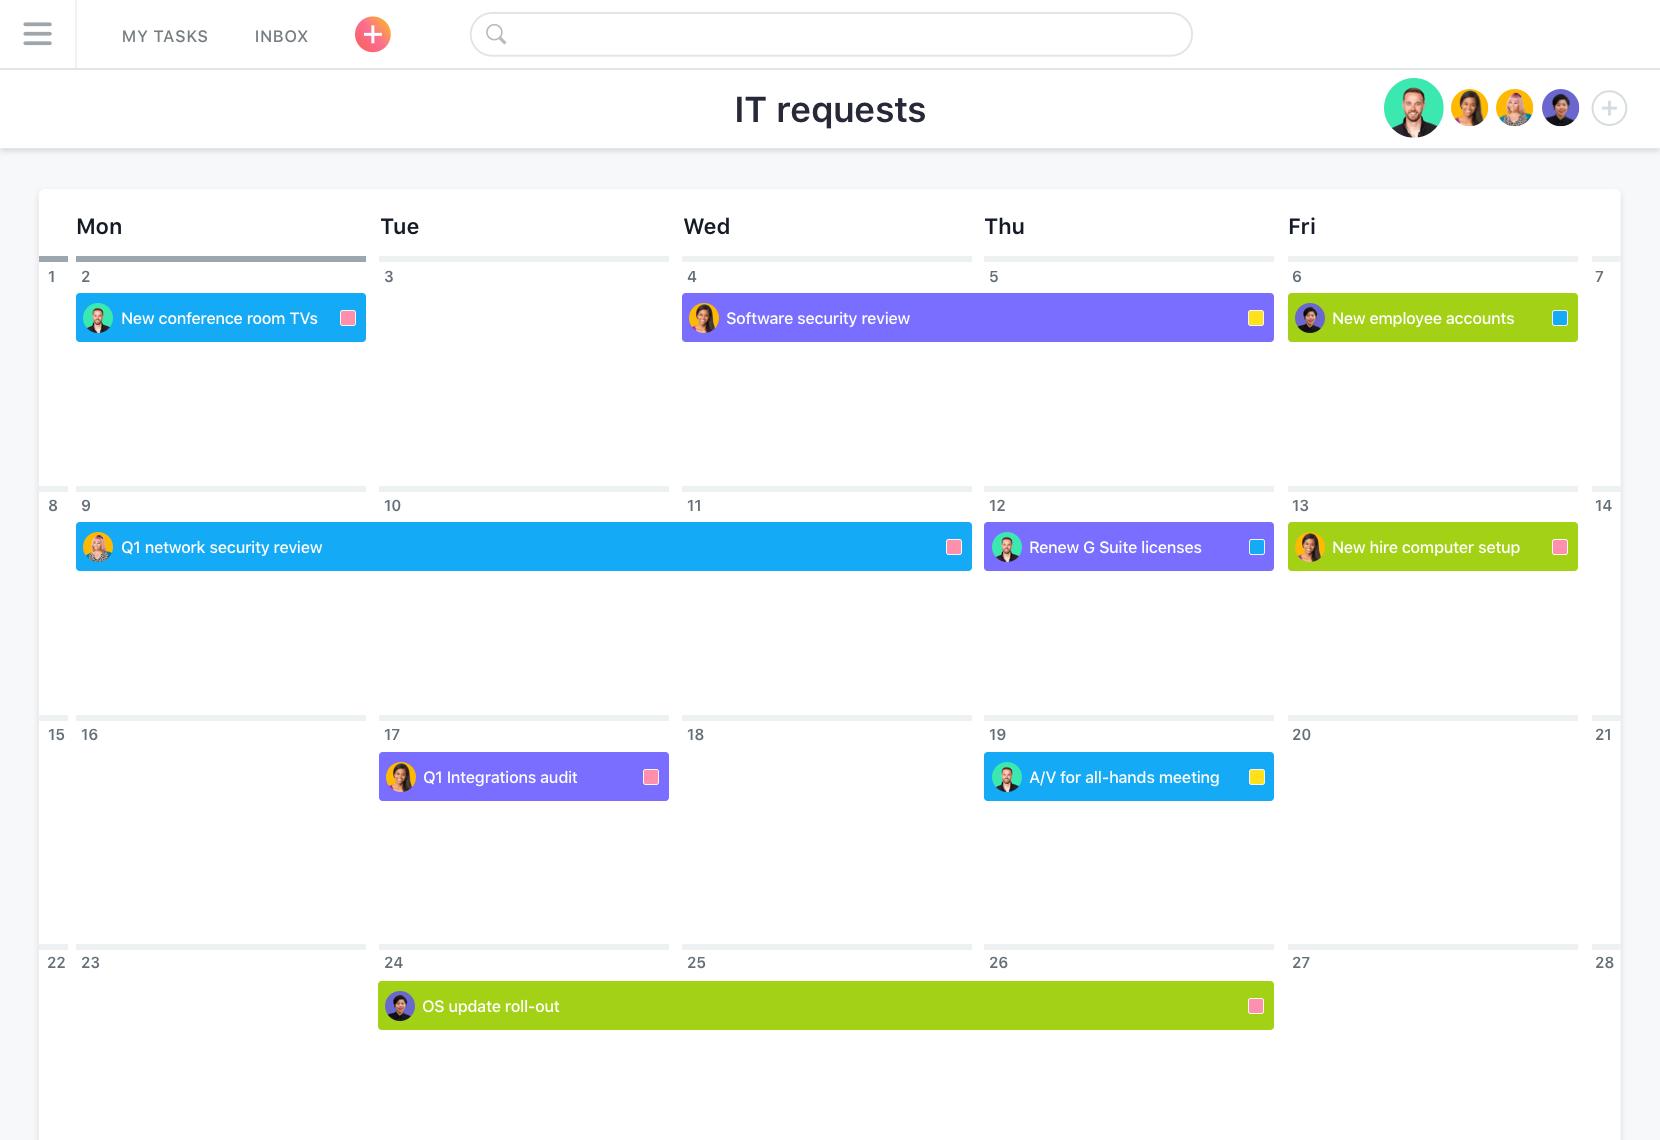 Asana Kalender, Asana: Single Sign-On (SSO), Task Manager, Import und Export von Daten (CSV, XLS)